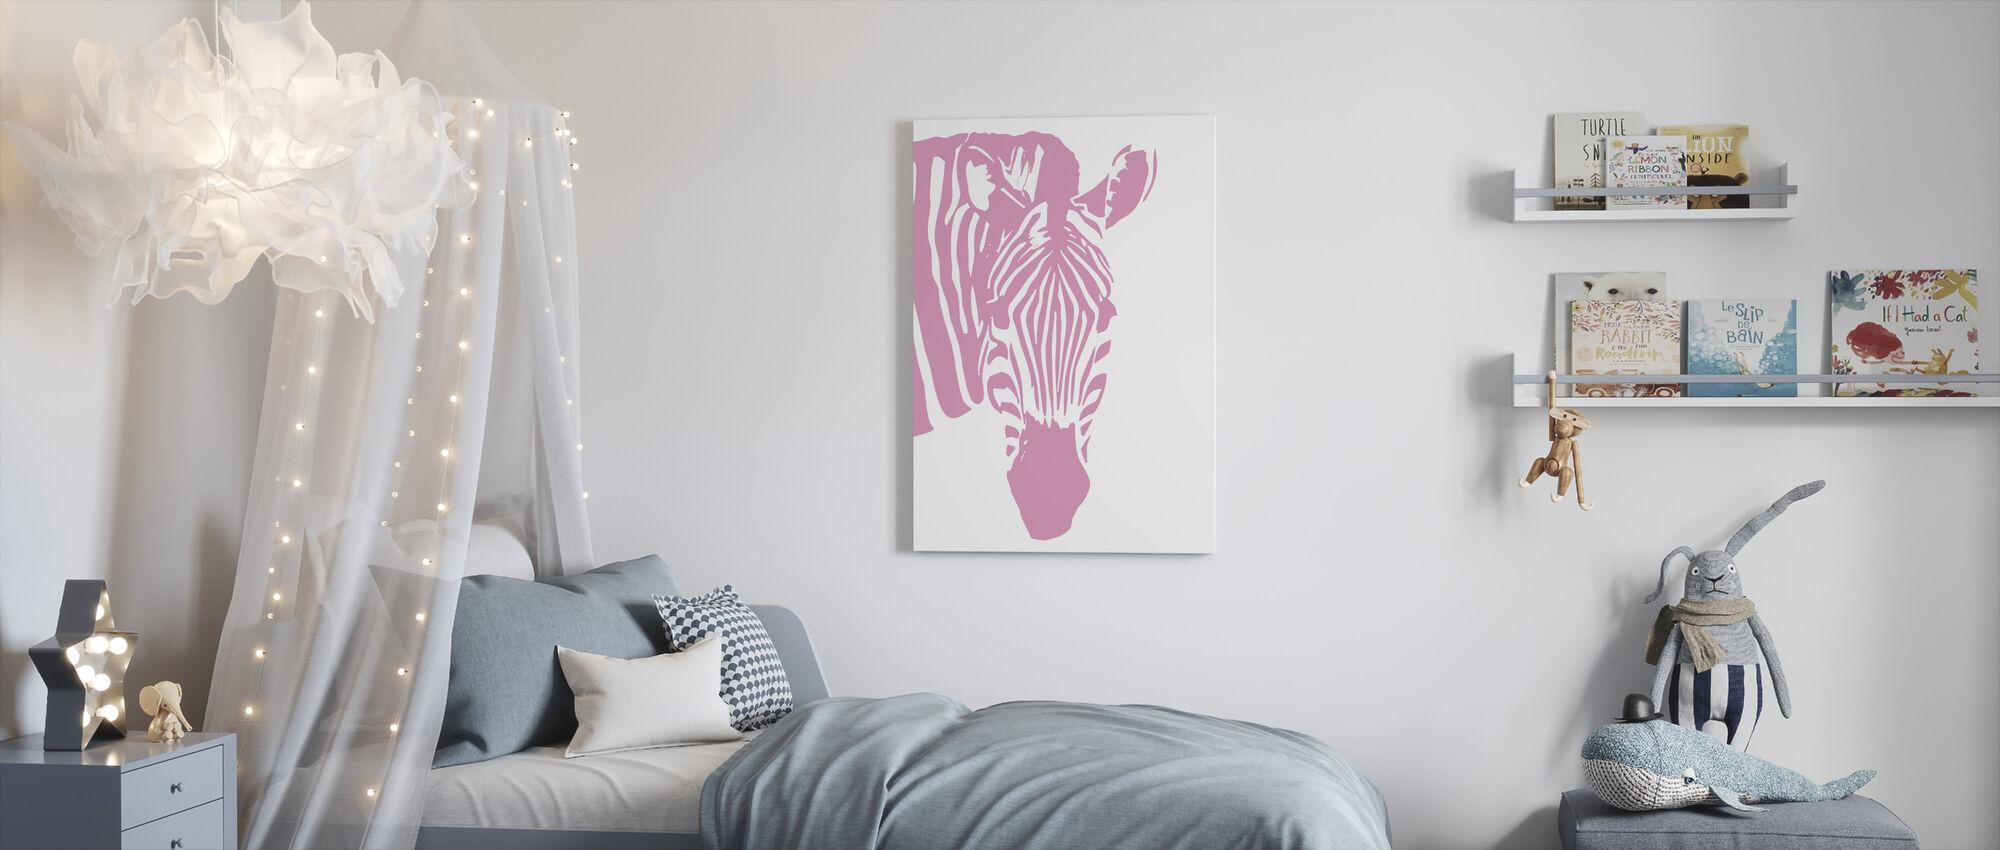 Watching Zebra - Canvas print - Kids Room